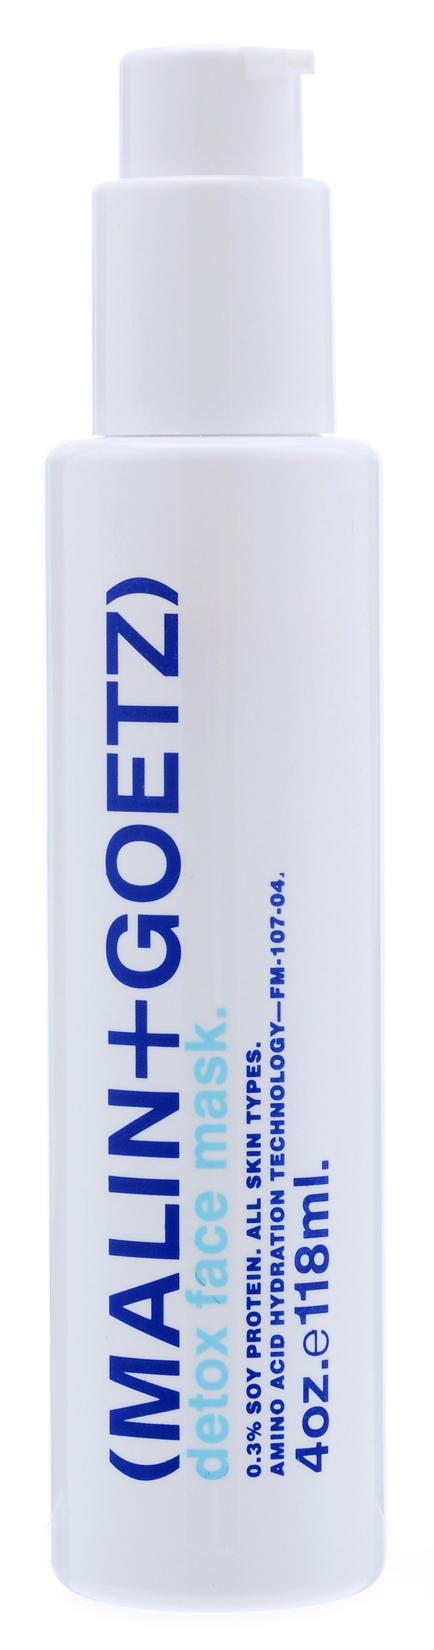 MALIN+GOETZ_Detox Face Mask (MECCA)